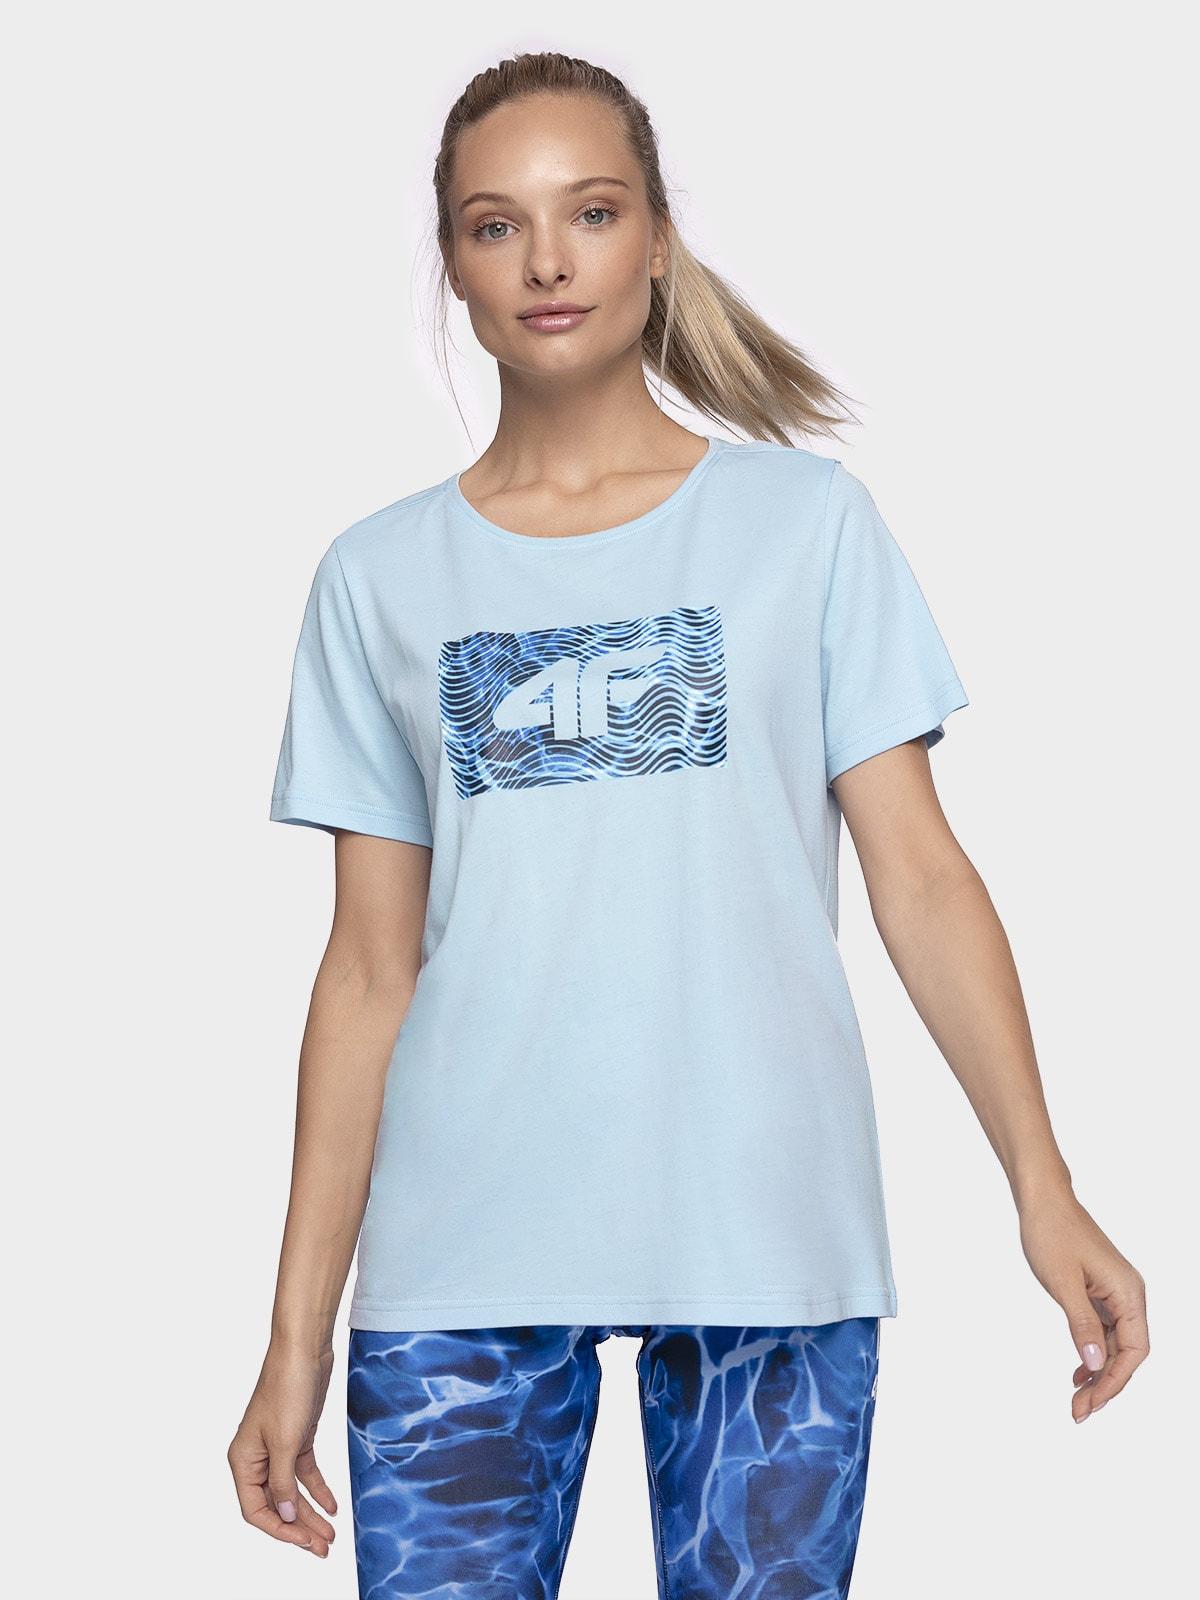 T-shirt damski TSD206 - jasny niebieski